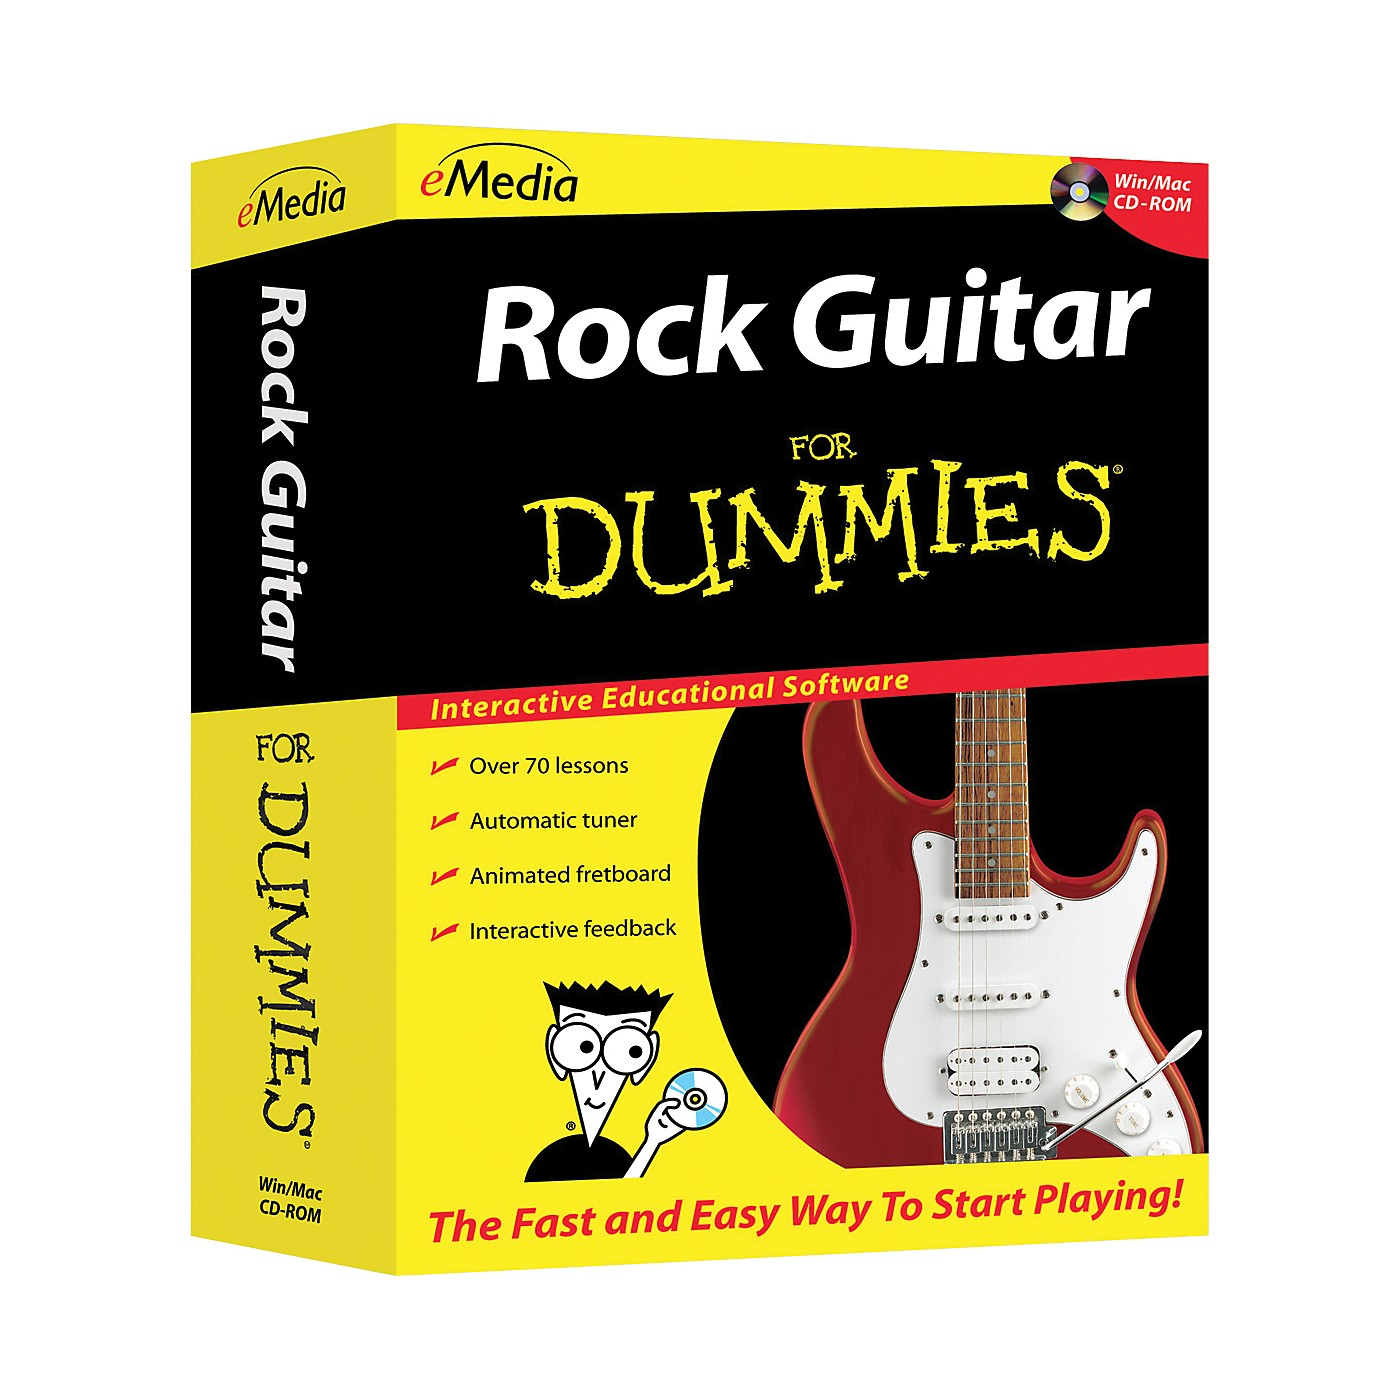 eMedia Rock Guitar For Dummies CD-ROM thumbnail